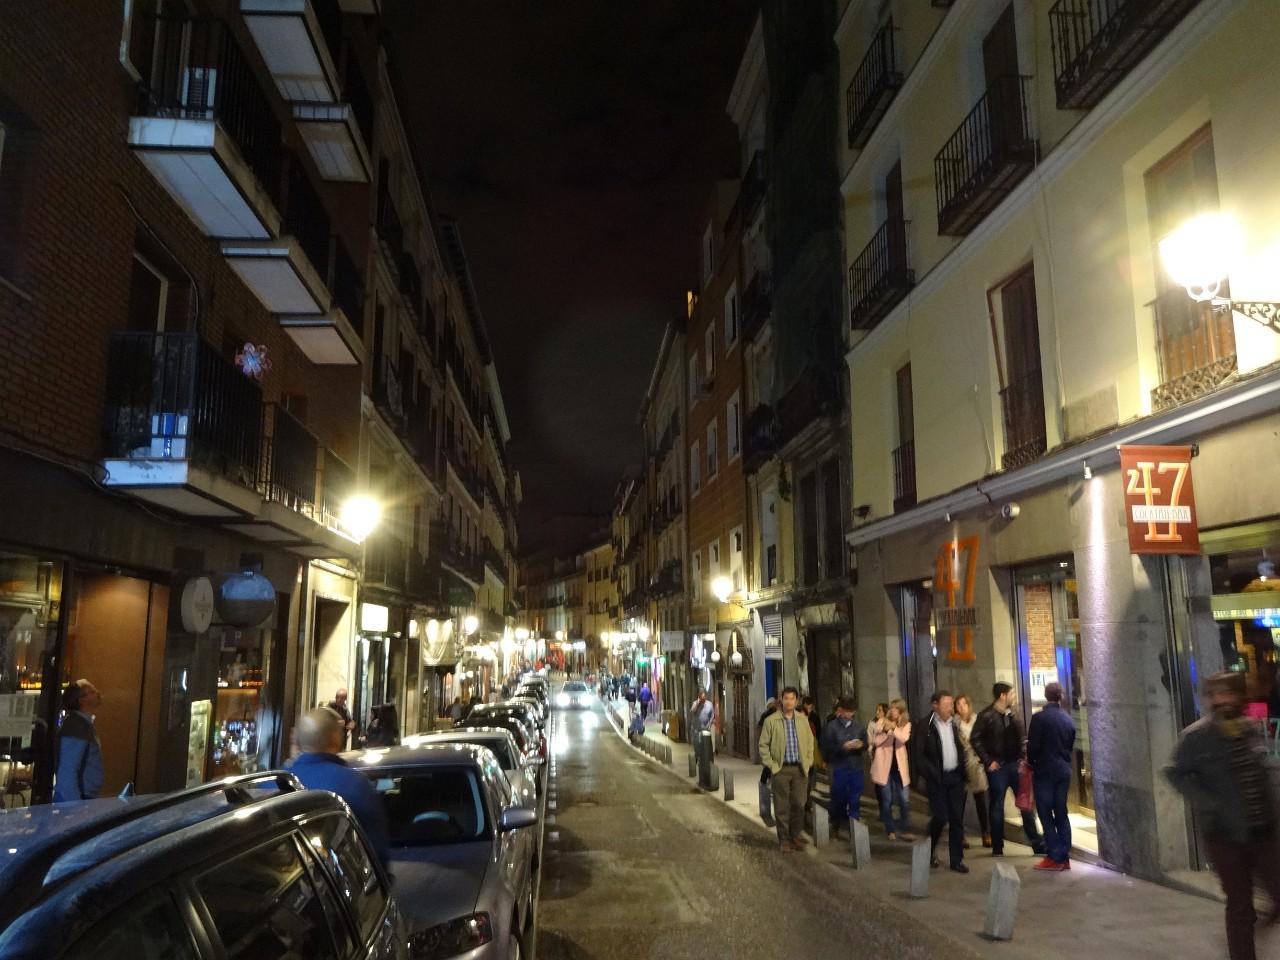 Calle de Cava Baja at midnight